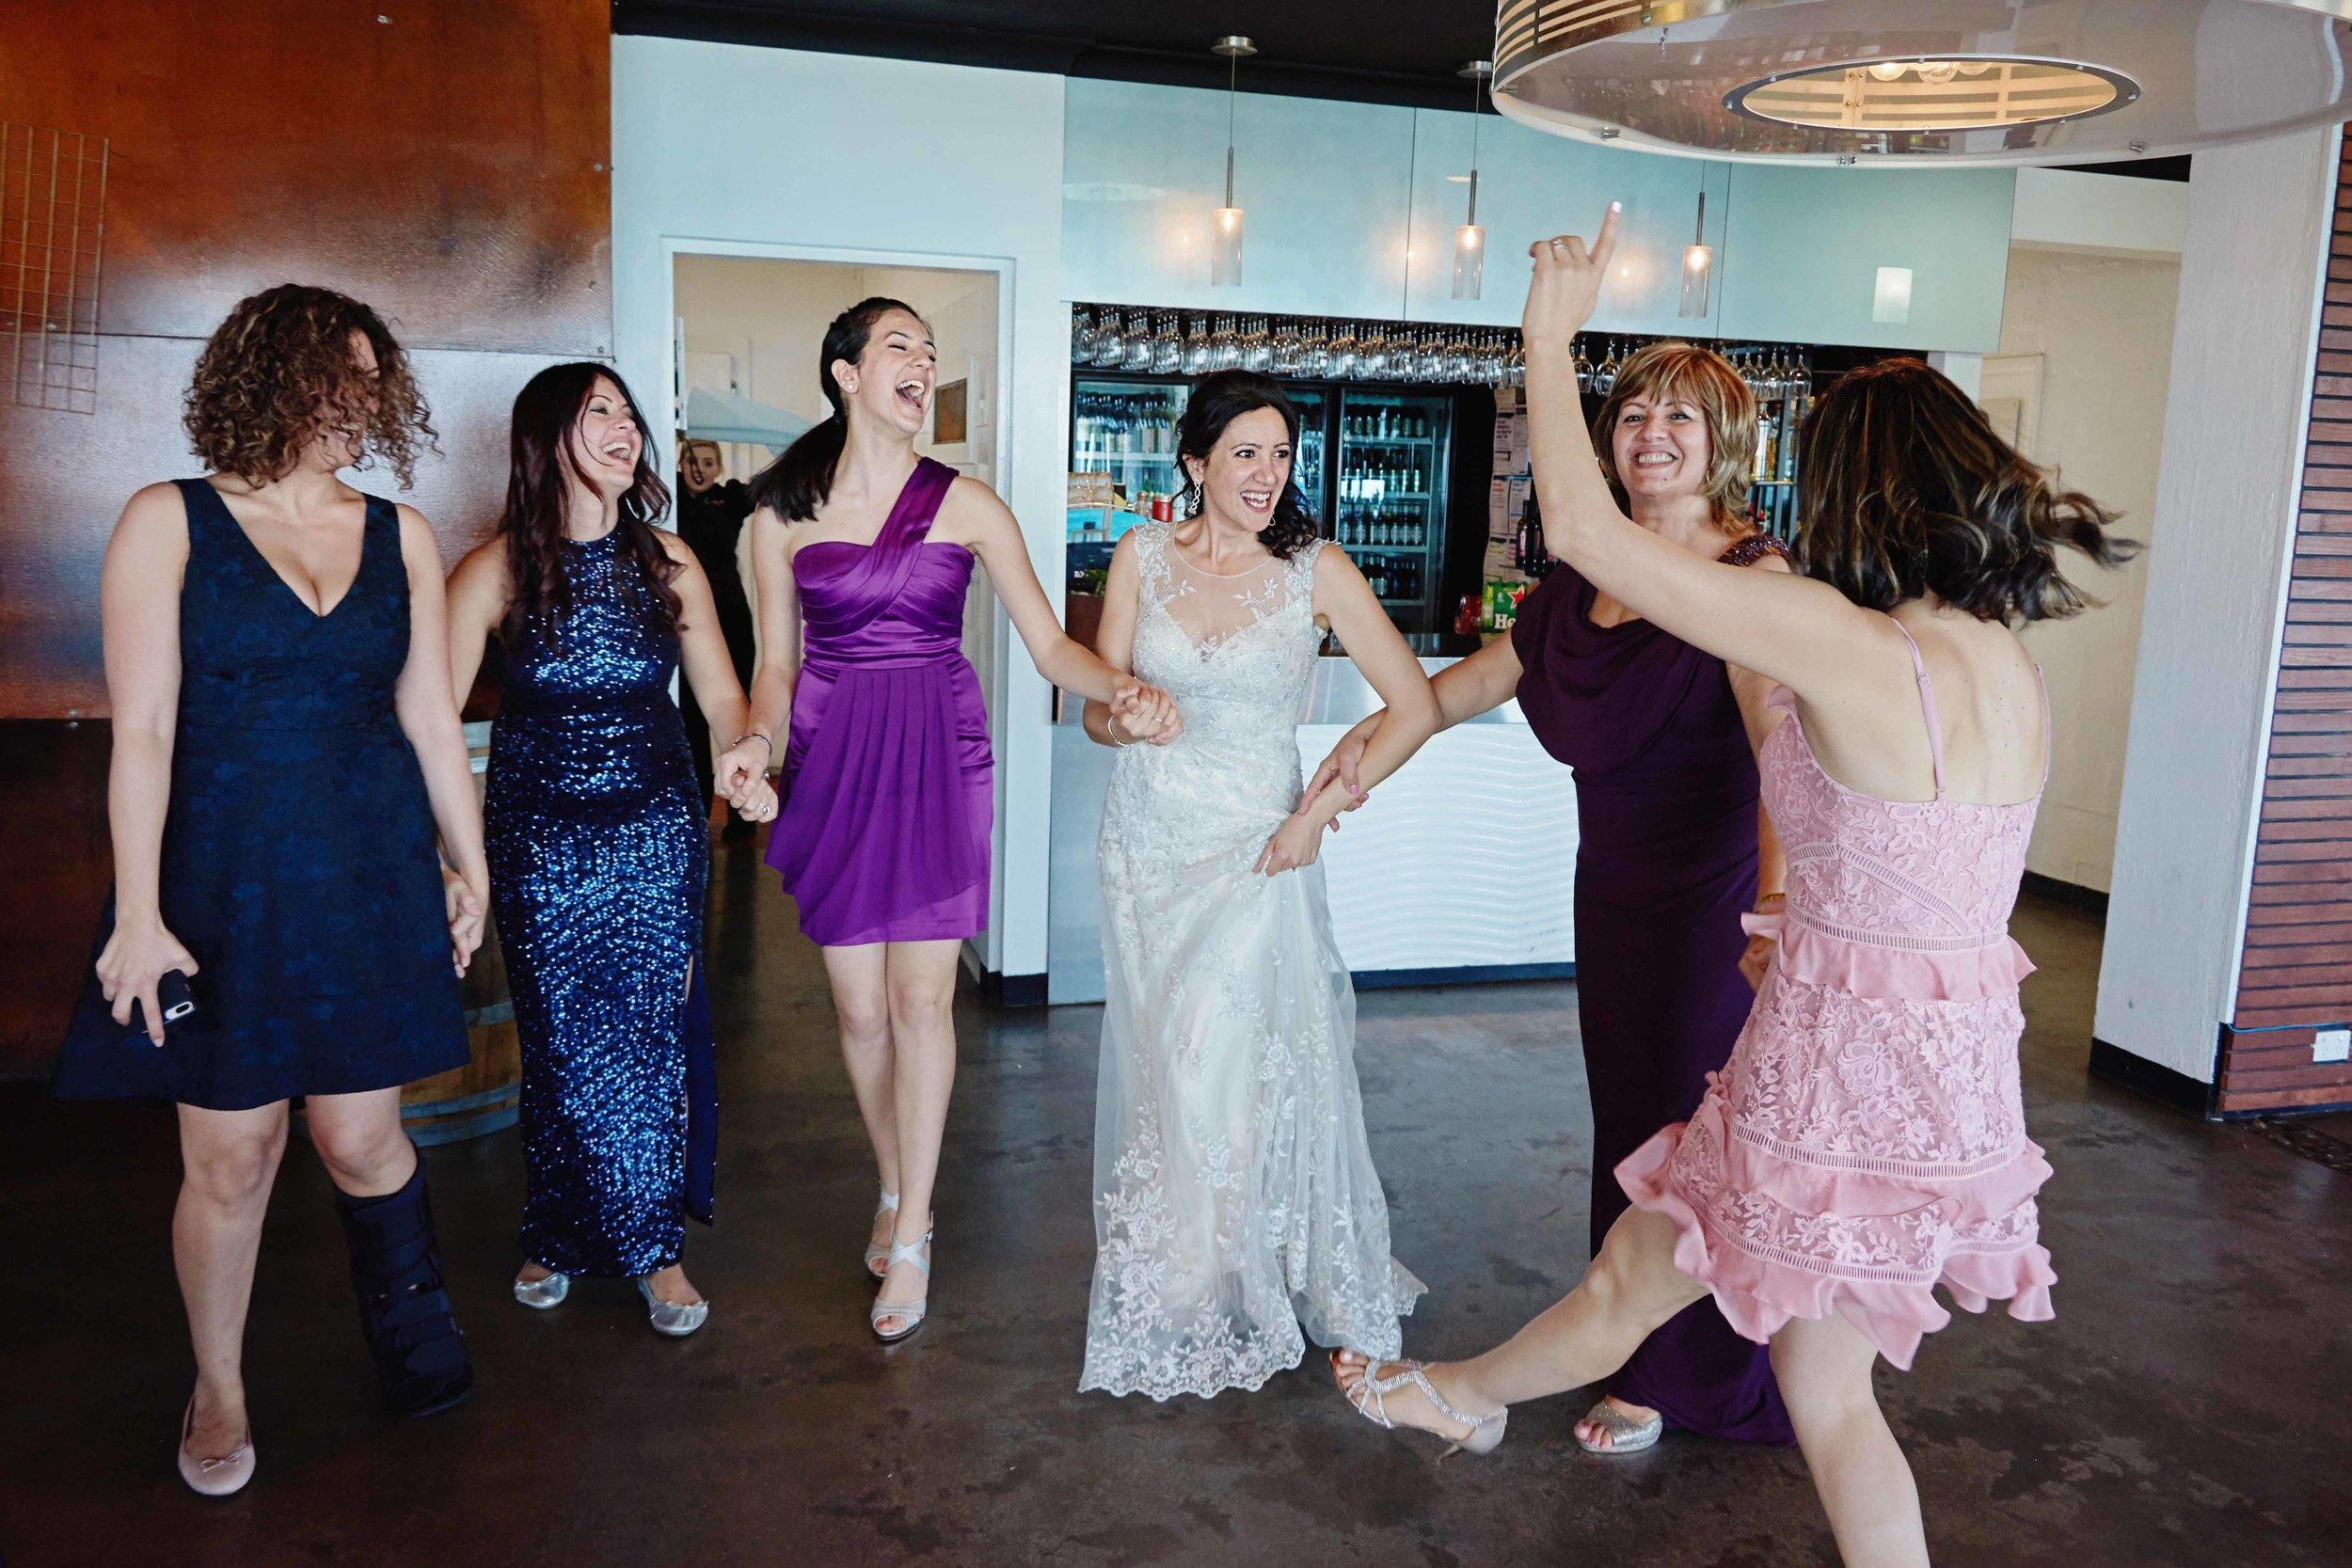 sorrento-wedding-photography-all-smiles-marissa-jade-photography-104.jpg